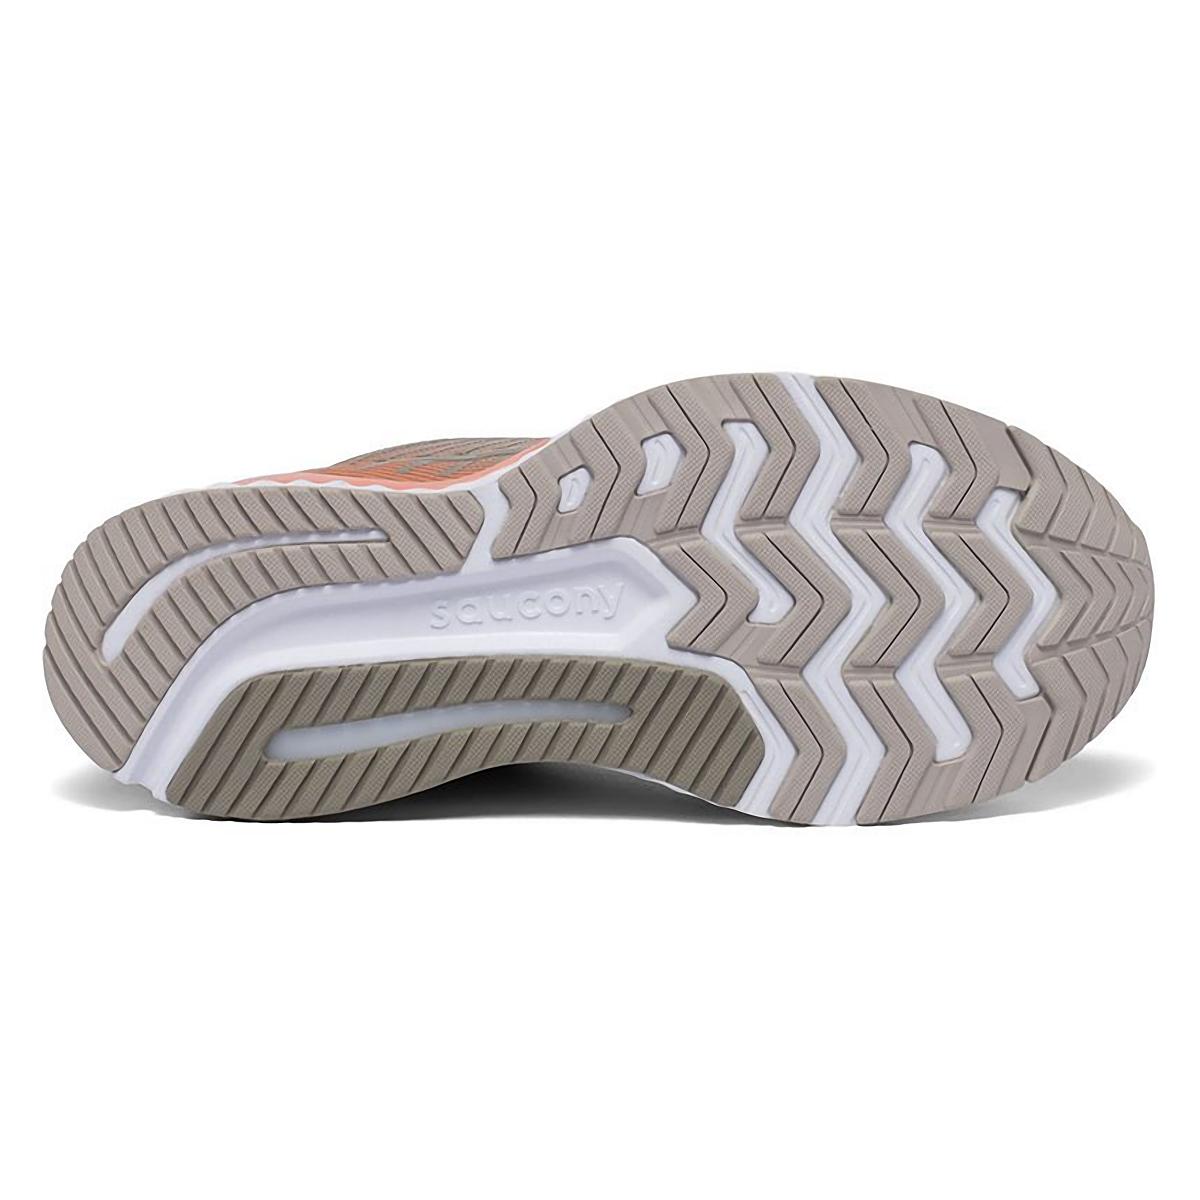 Women's Saucony Gude 13 Running Shoe - Color: Moonrock/Coral - Size: 5 - Width: Regular, Moonrock/Coral, large, image 4